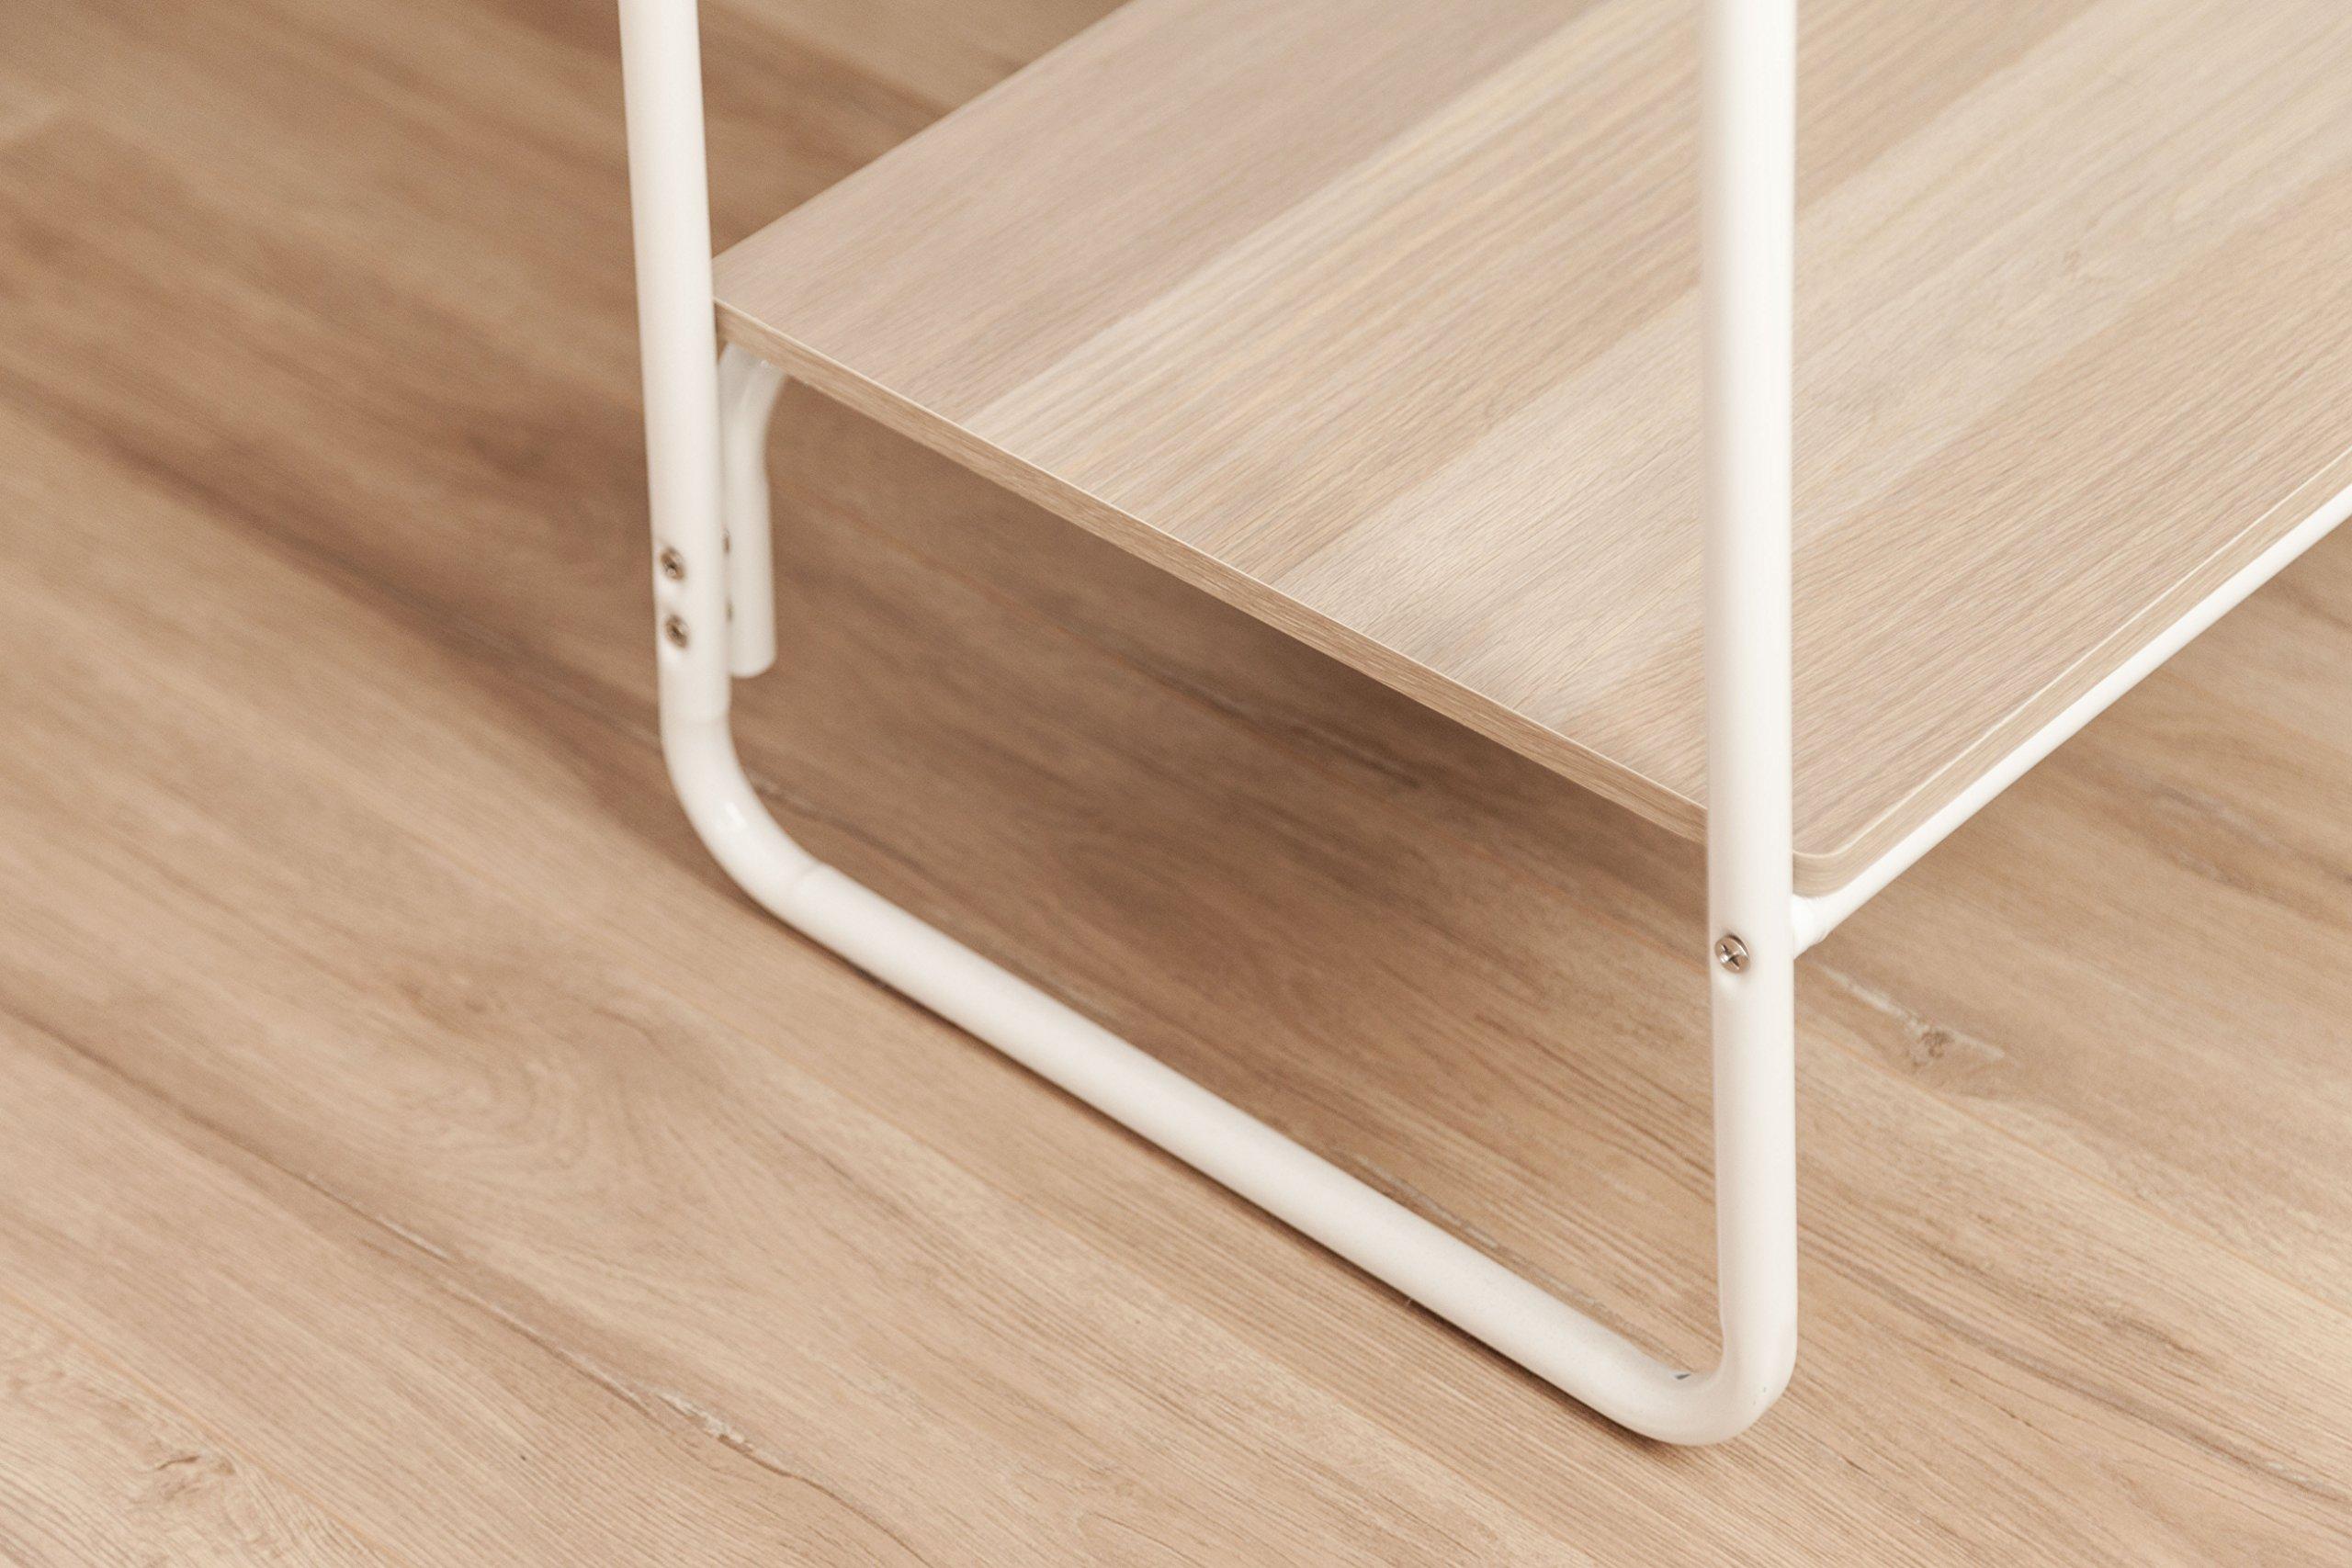 IRIS Metal Garment Rack with 2 Wood Shelves, White and Light Brown by IRIS USA, Inc. (Image #5)